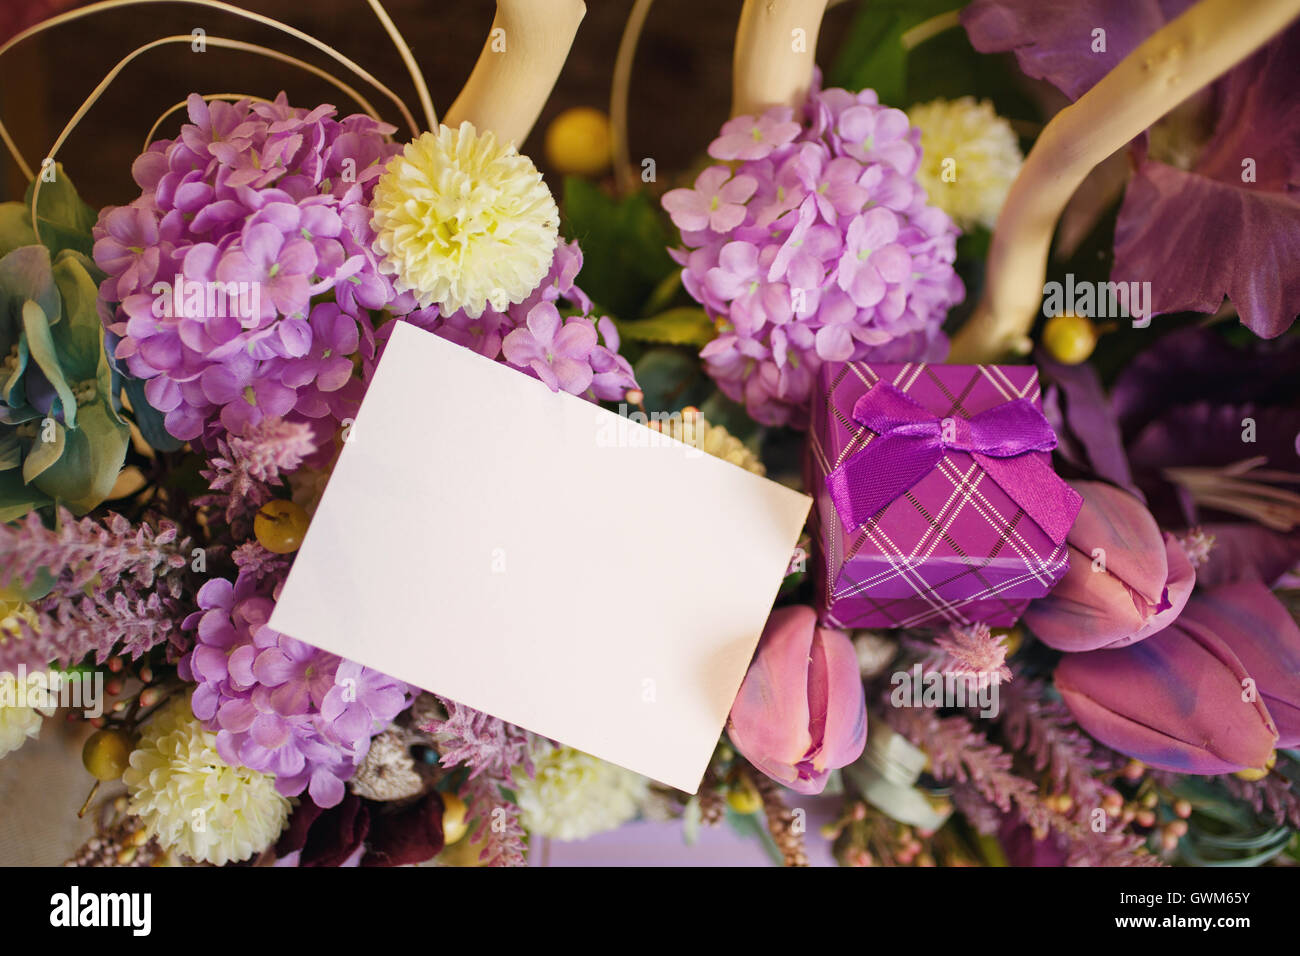 blumen im korb neben leere karte textfreiraum stockfoto bild 119072519 alamy. Black Bedroom Furniture Sets. Home Design Ideas